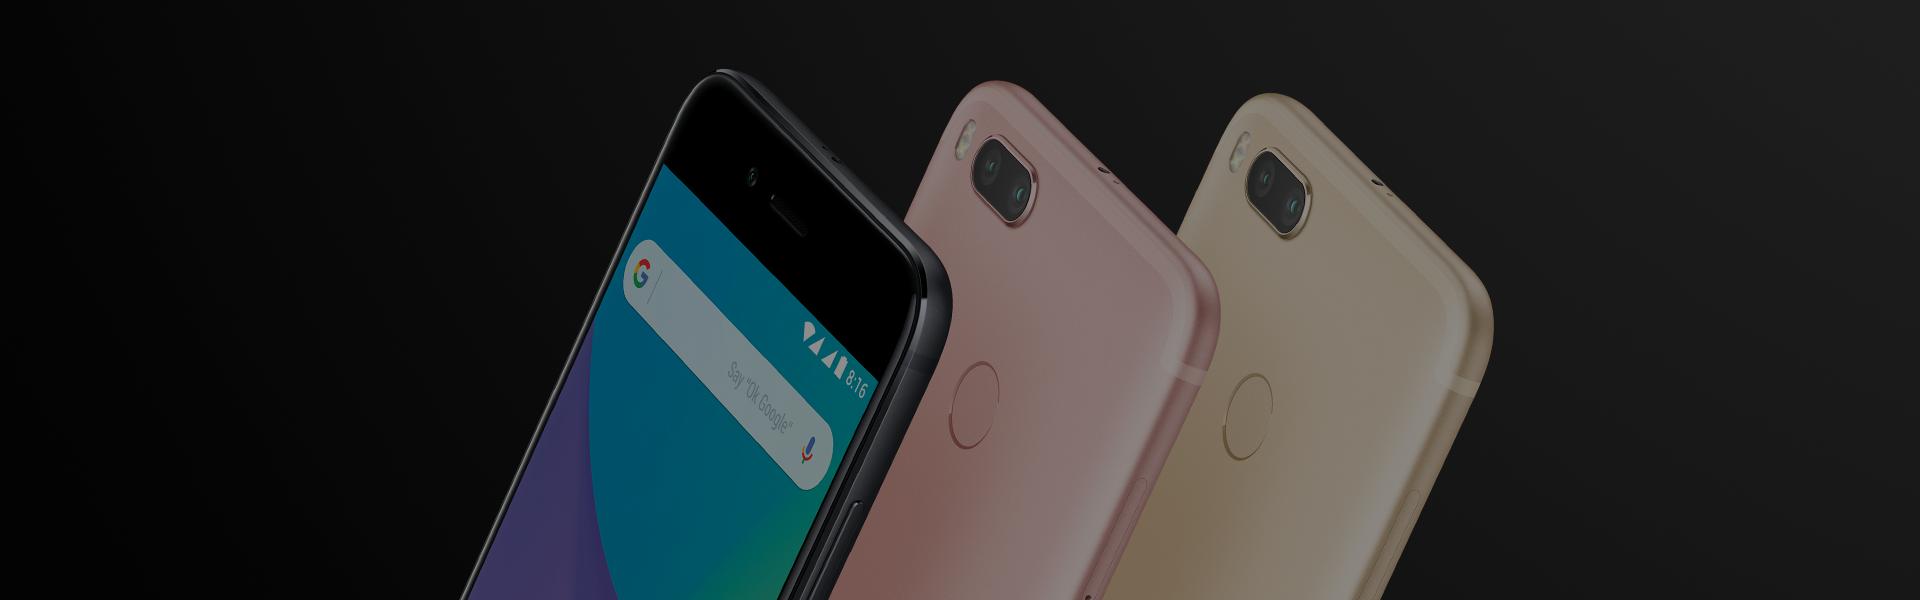 RECENSIONE Xiaomi Mi A1, IL best-buy di fine 2017